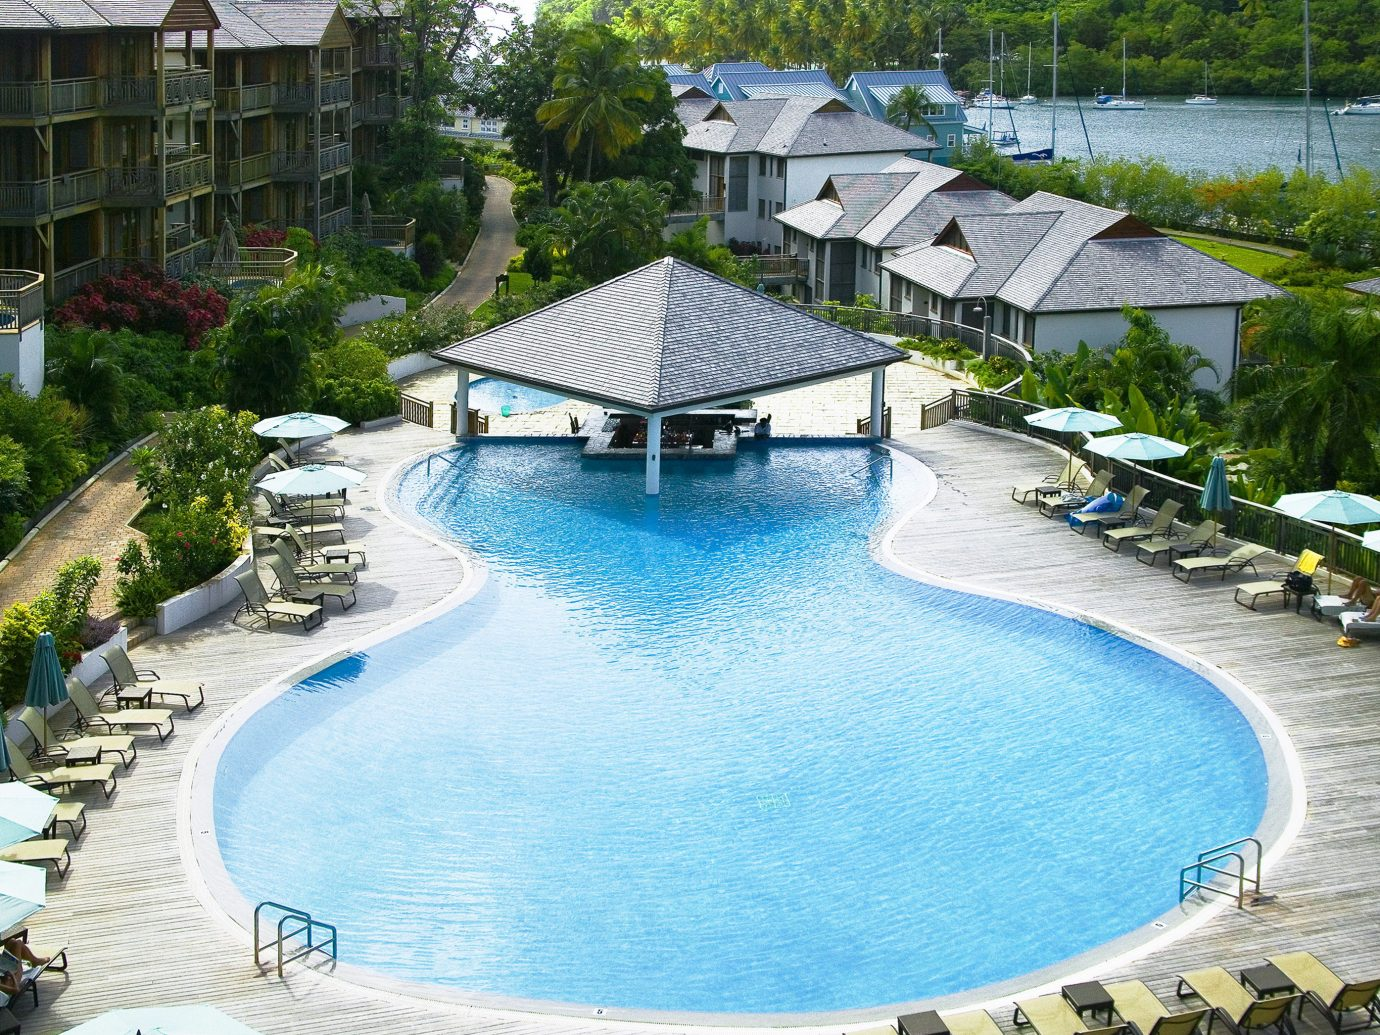 Hotels Luxury Travel water swimming pool outdoor Resort Pool property estate backyard condominium resort town swimming Villa surrounded